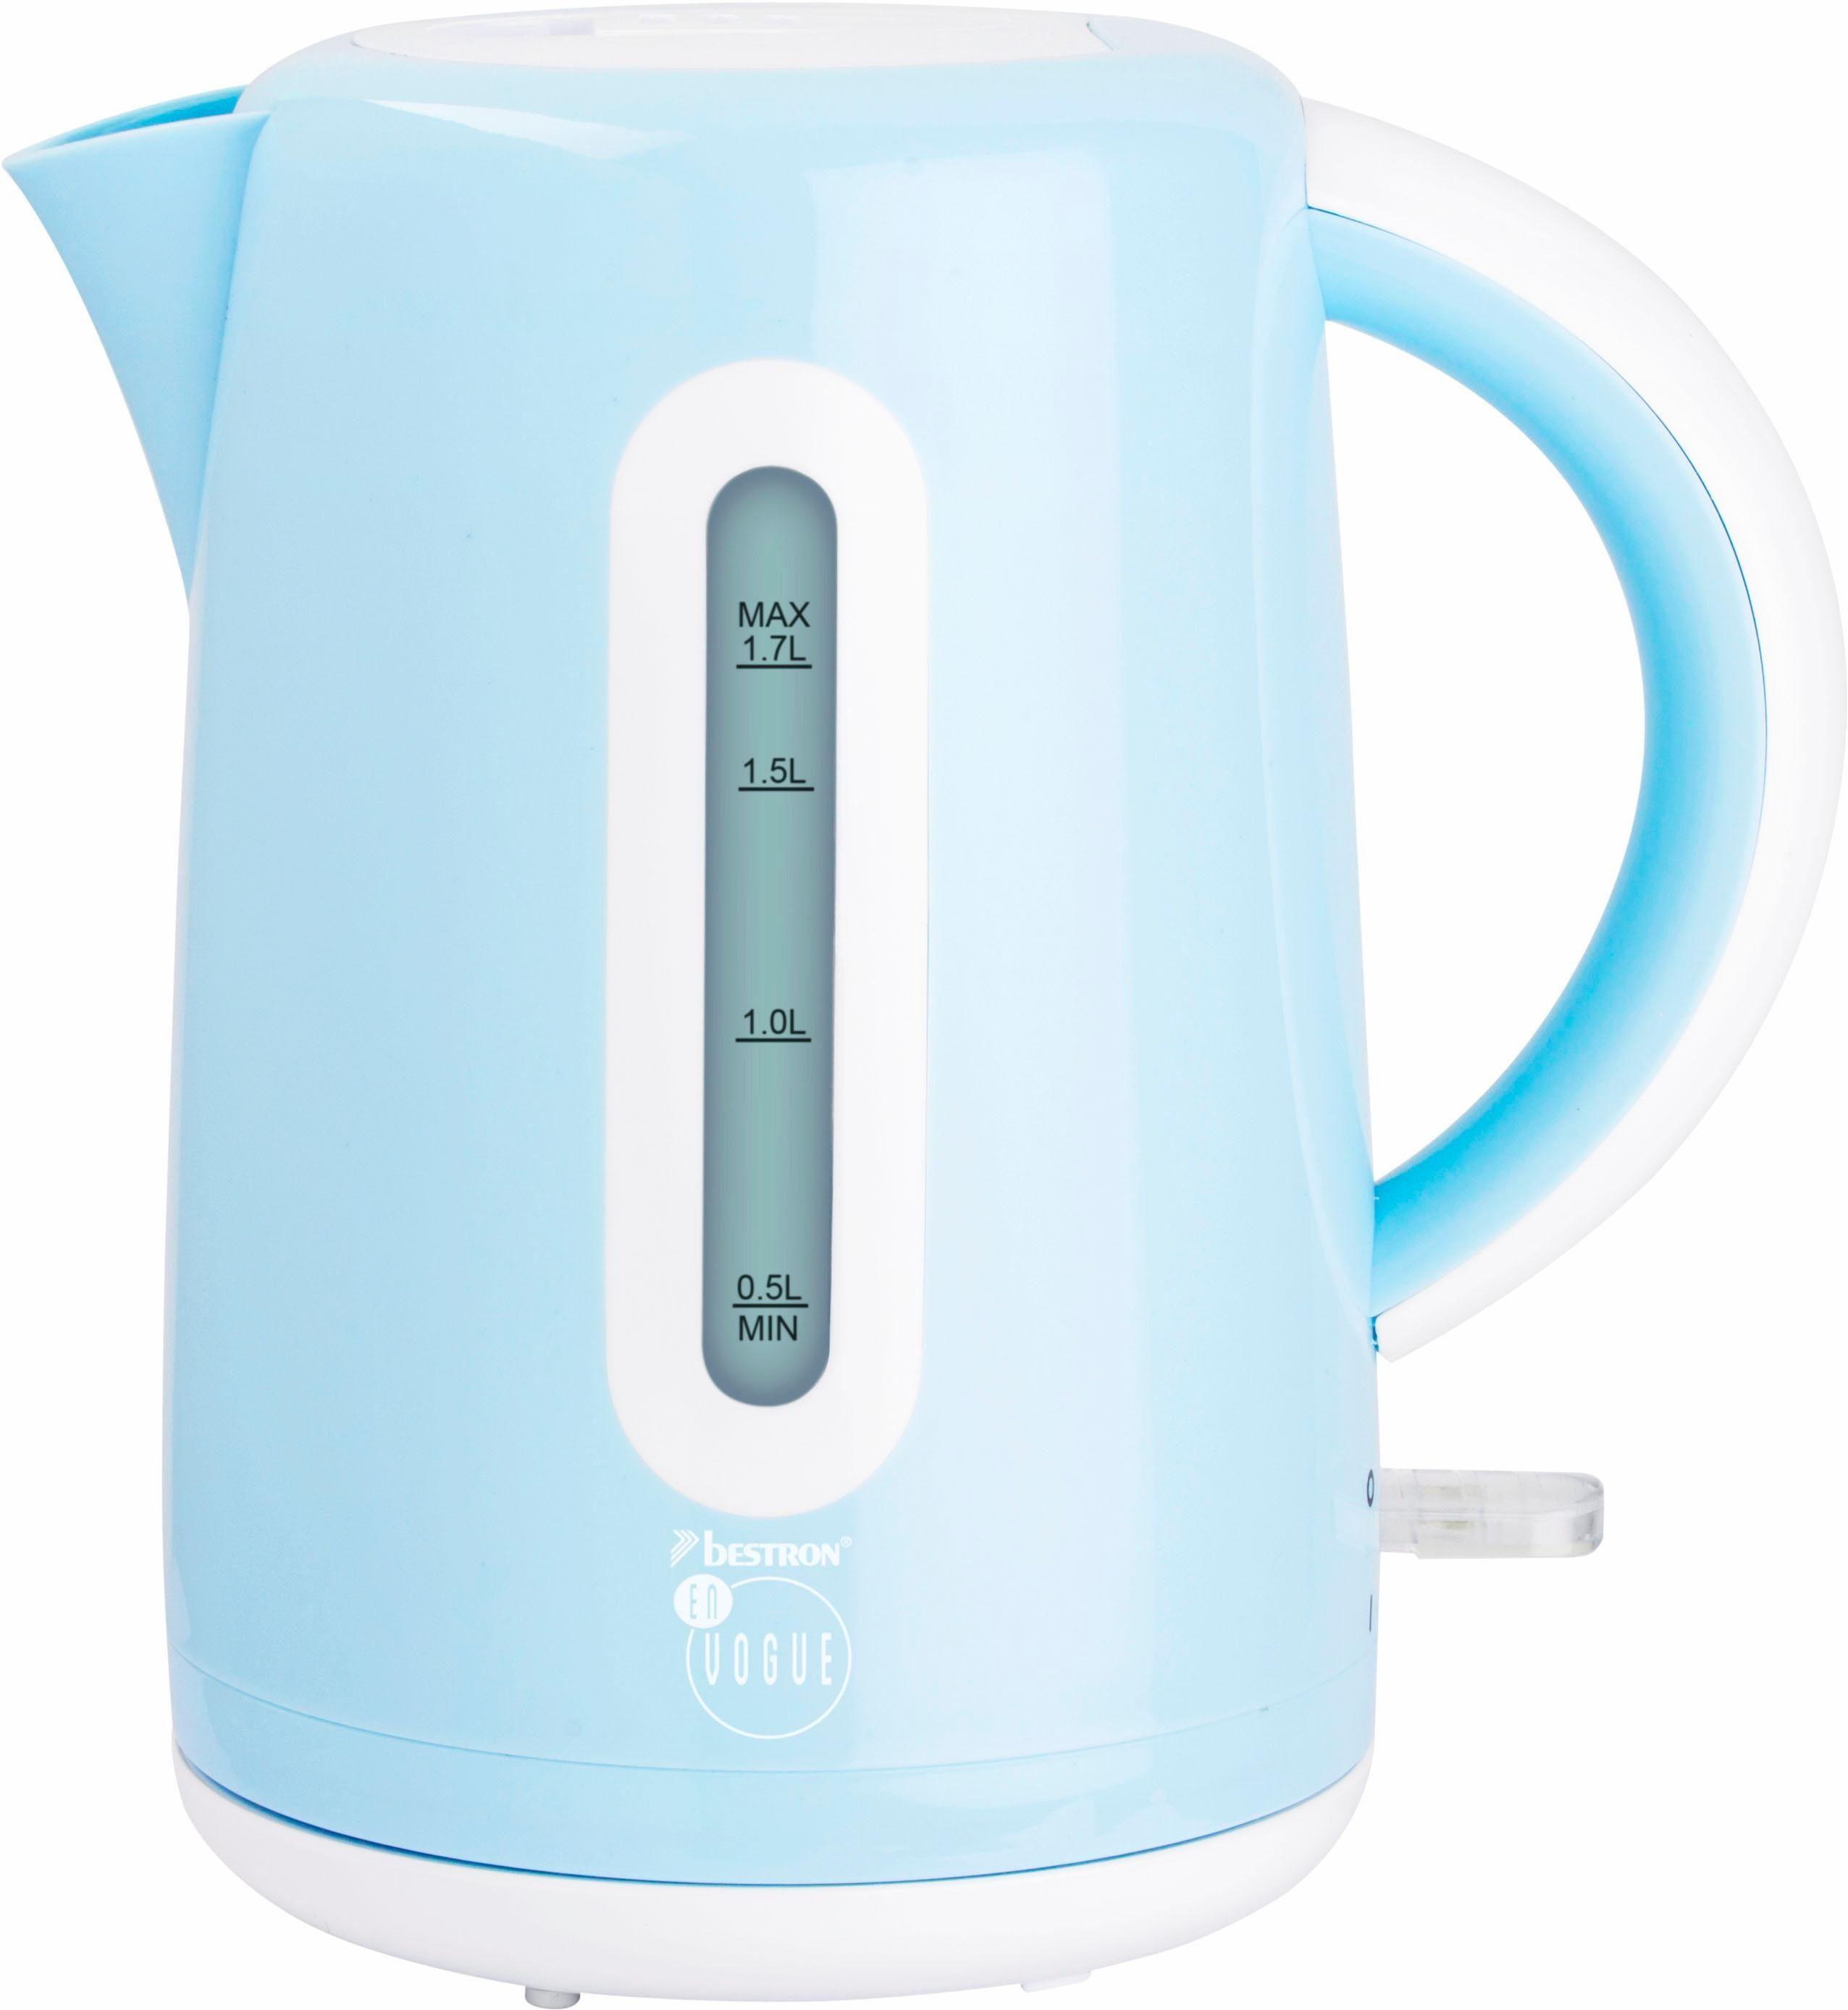 Bestron Wasserkocher AWK300EVB, 1,7 Liter, 1850-2200 Watt, blau